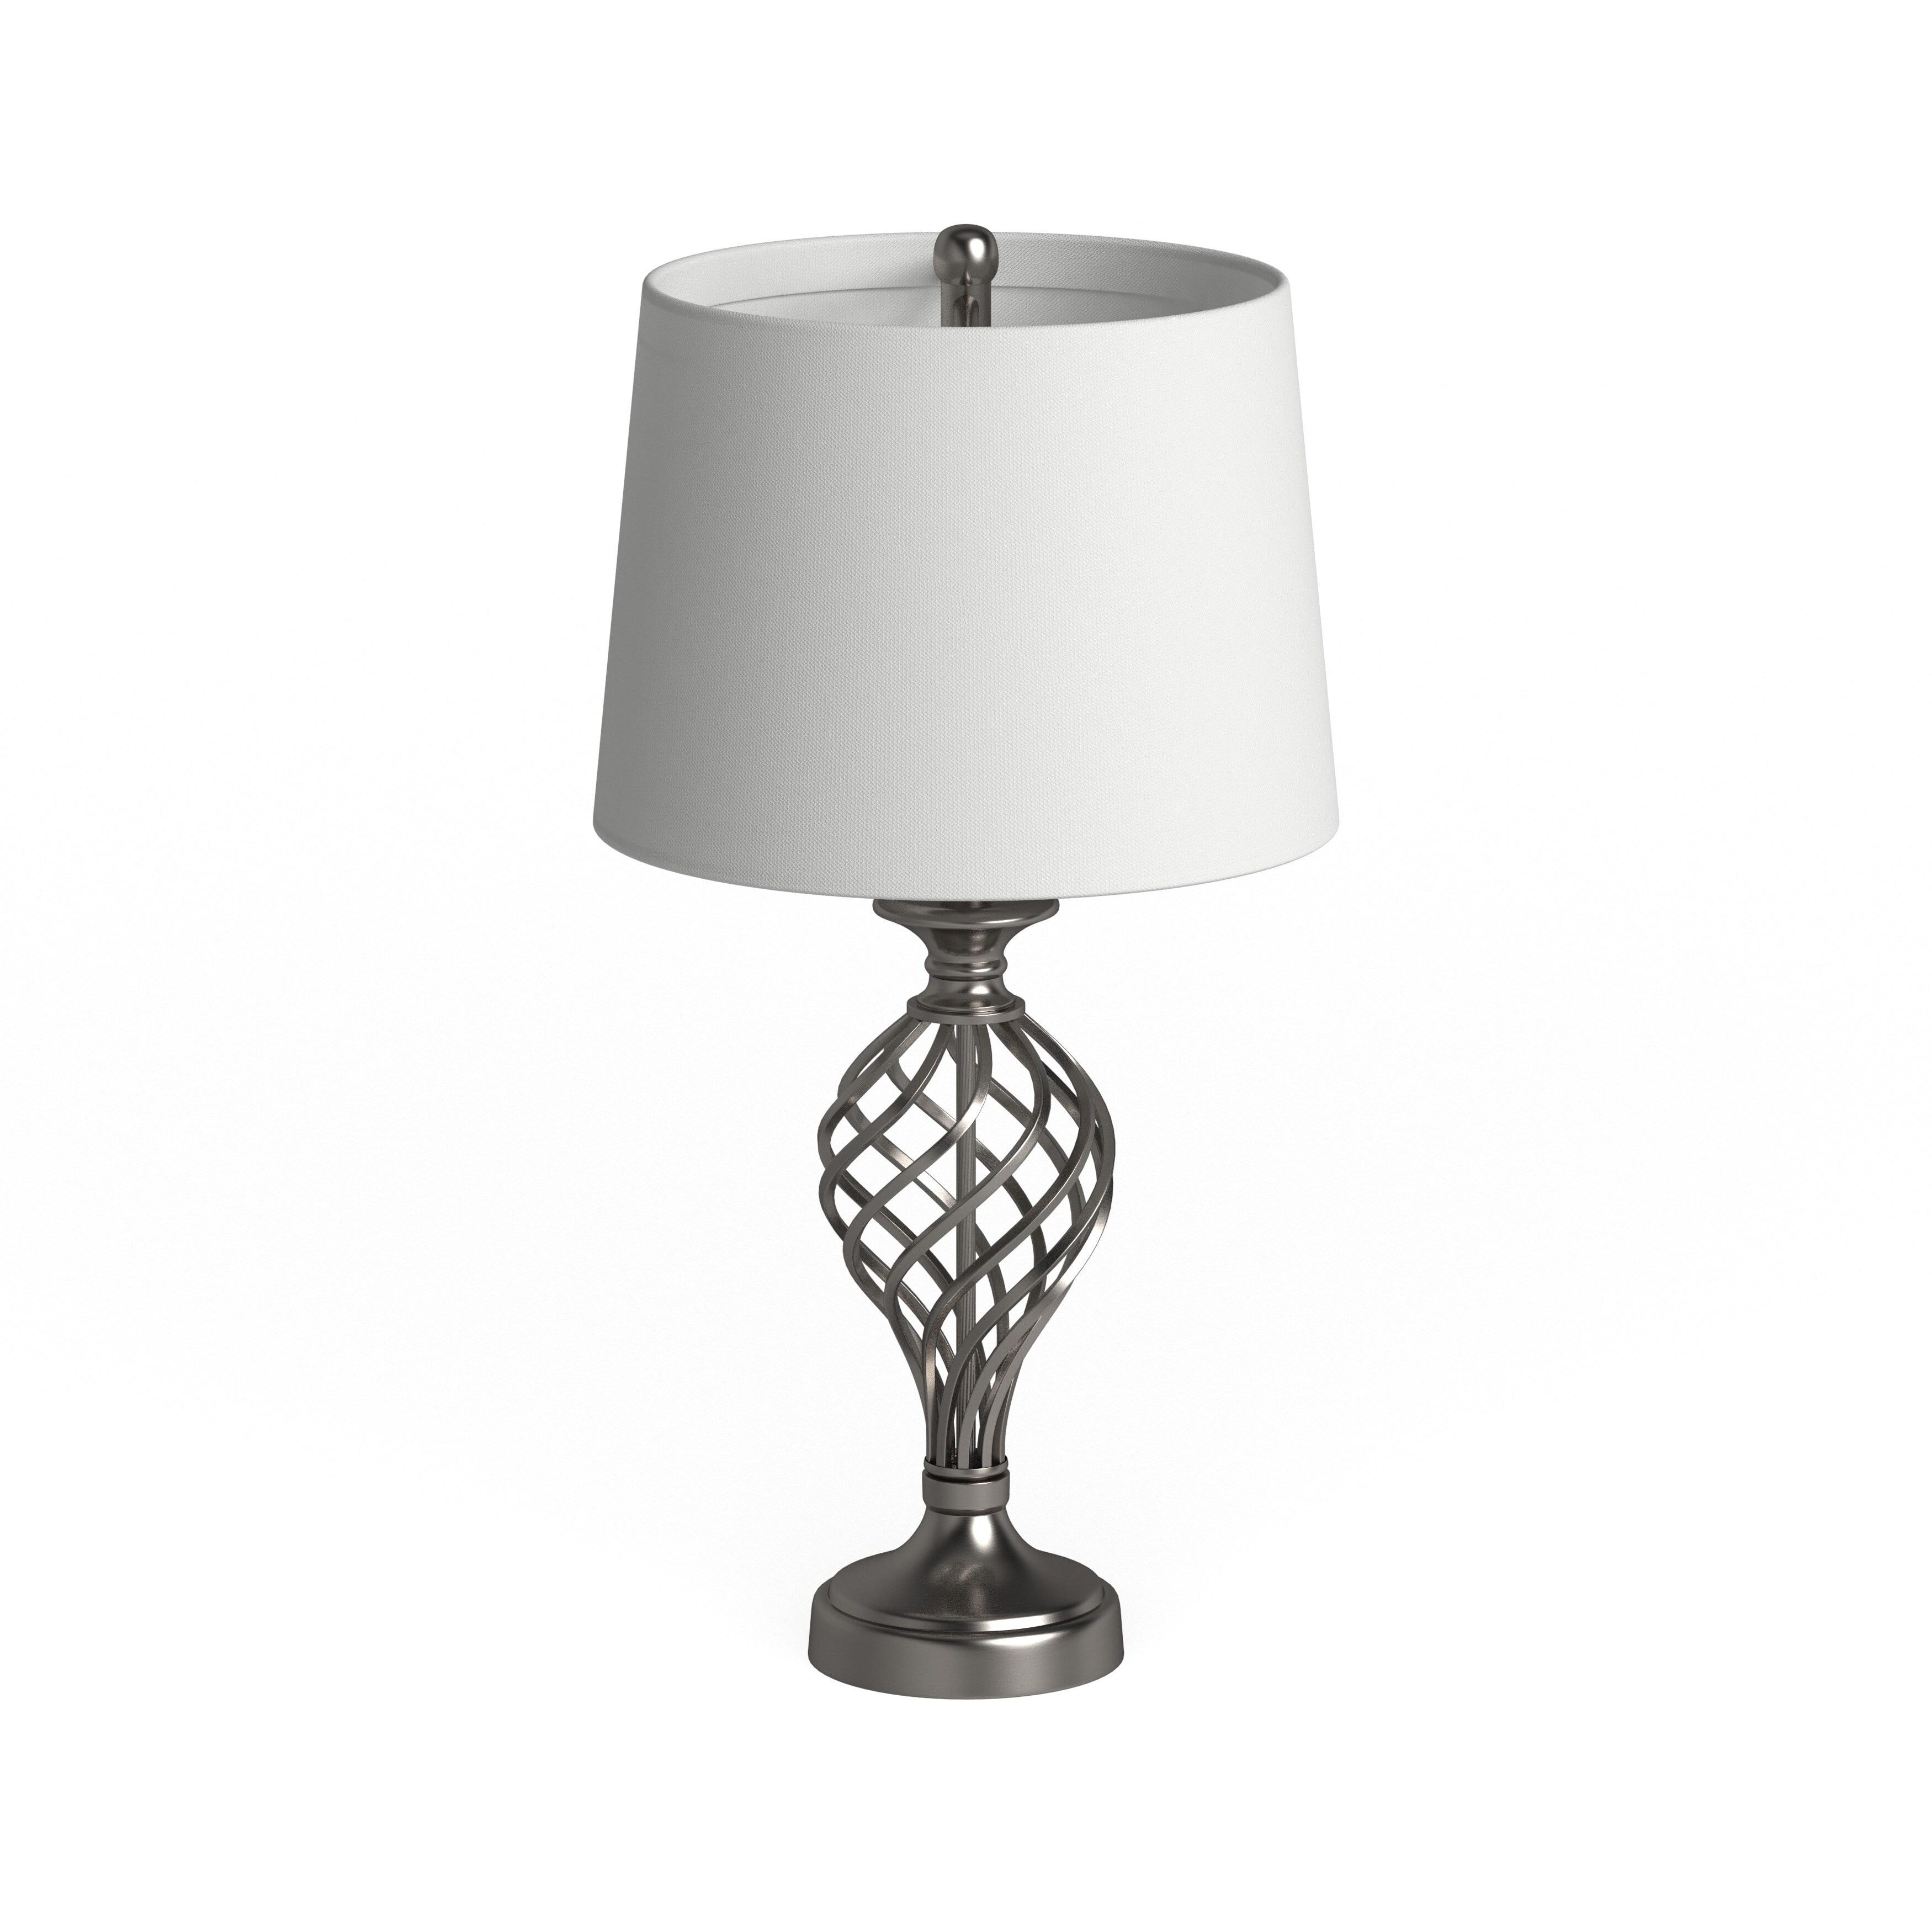 Safavieh Lighting 27 Inch Lattice Urn Nickel Table Lamp Set Of 2 14 X14 X26 75 On Sale Overstock 9527283